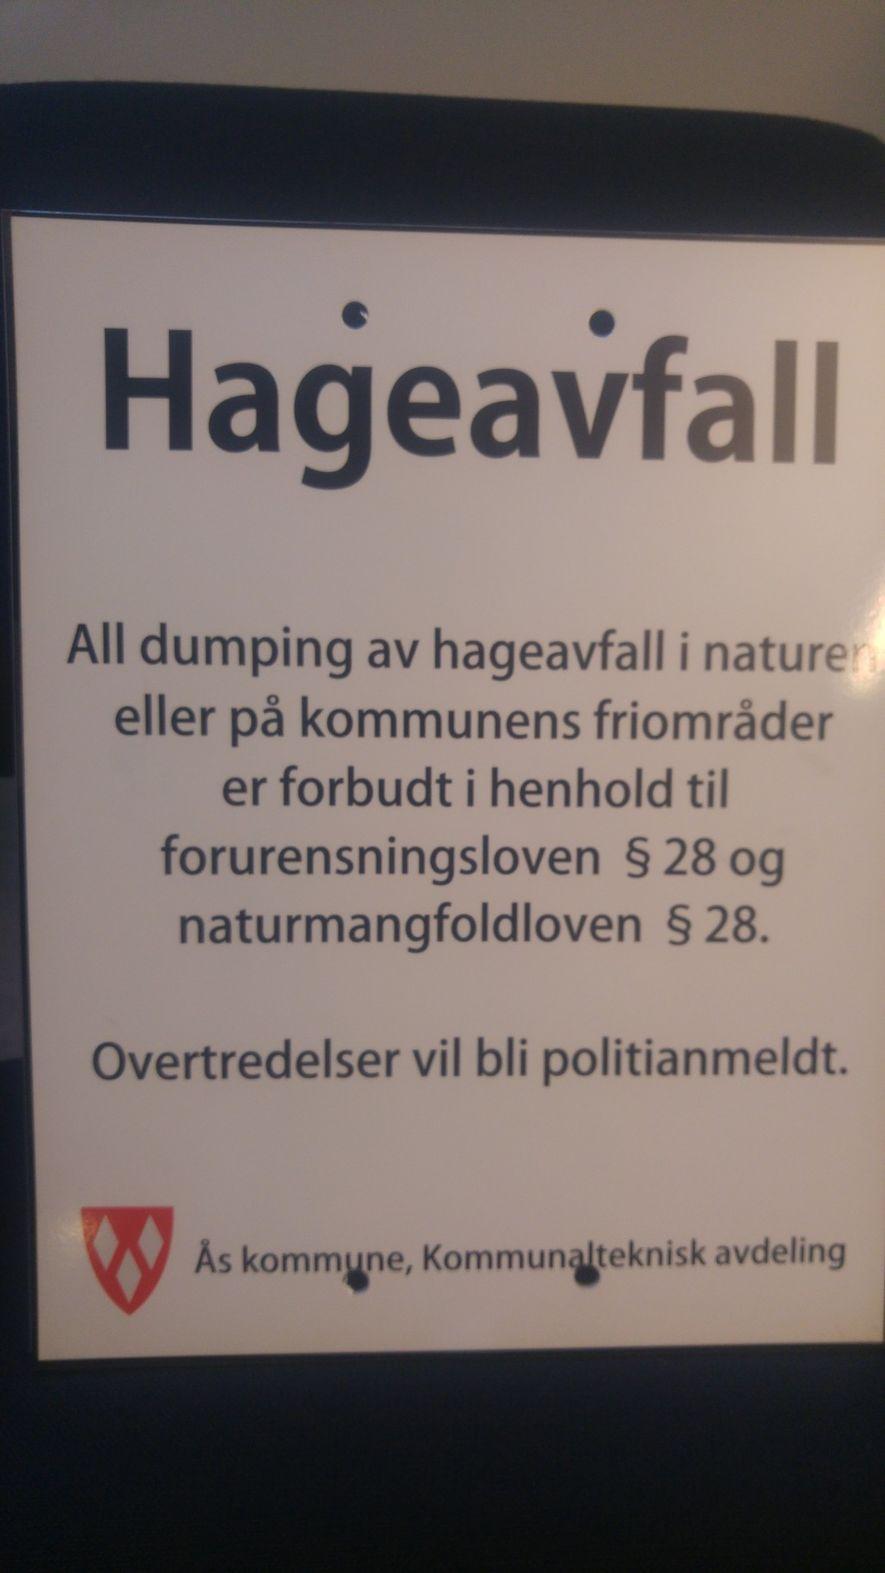 Hageavfall_1024x1820